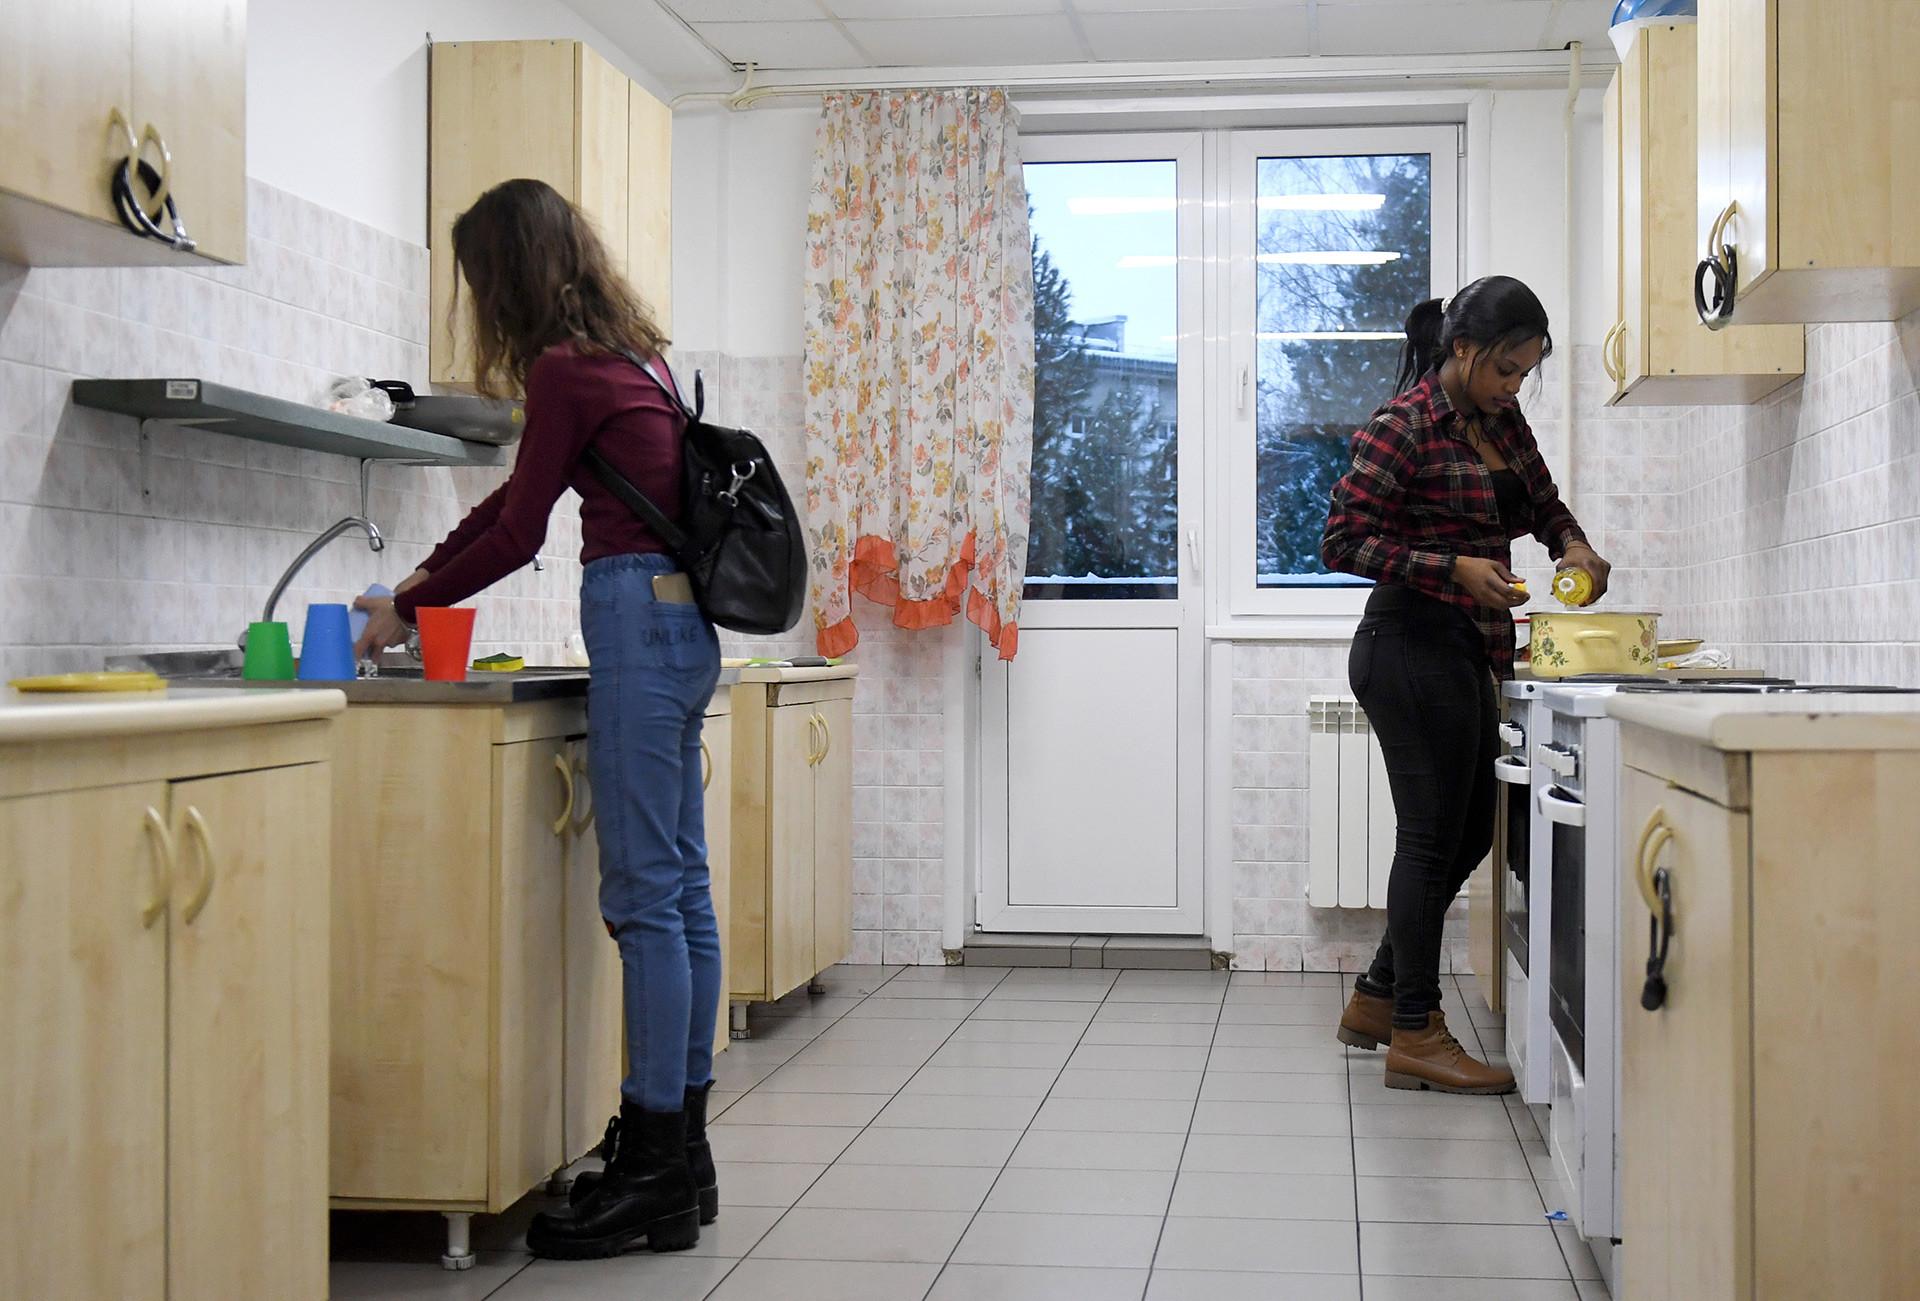 Student dorm, Russia